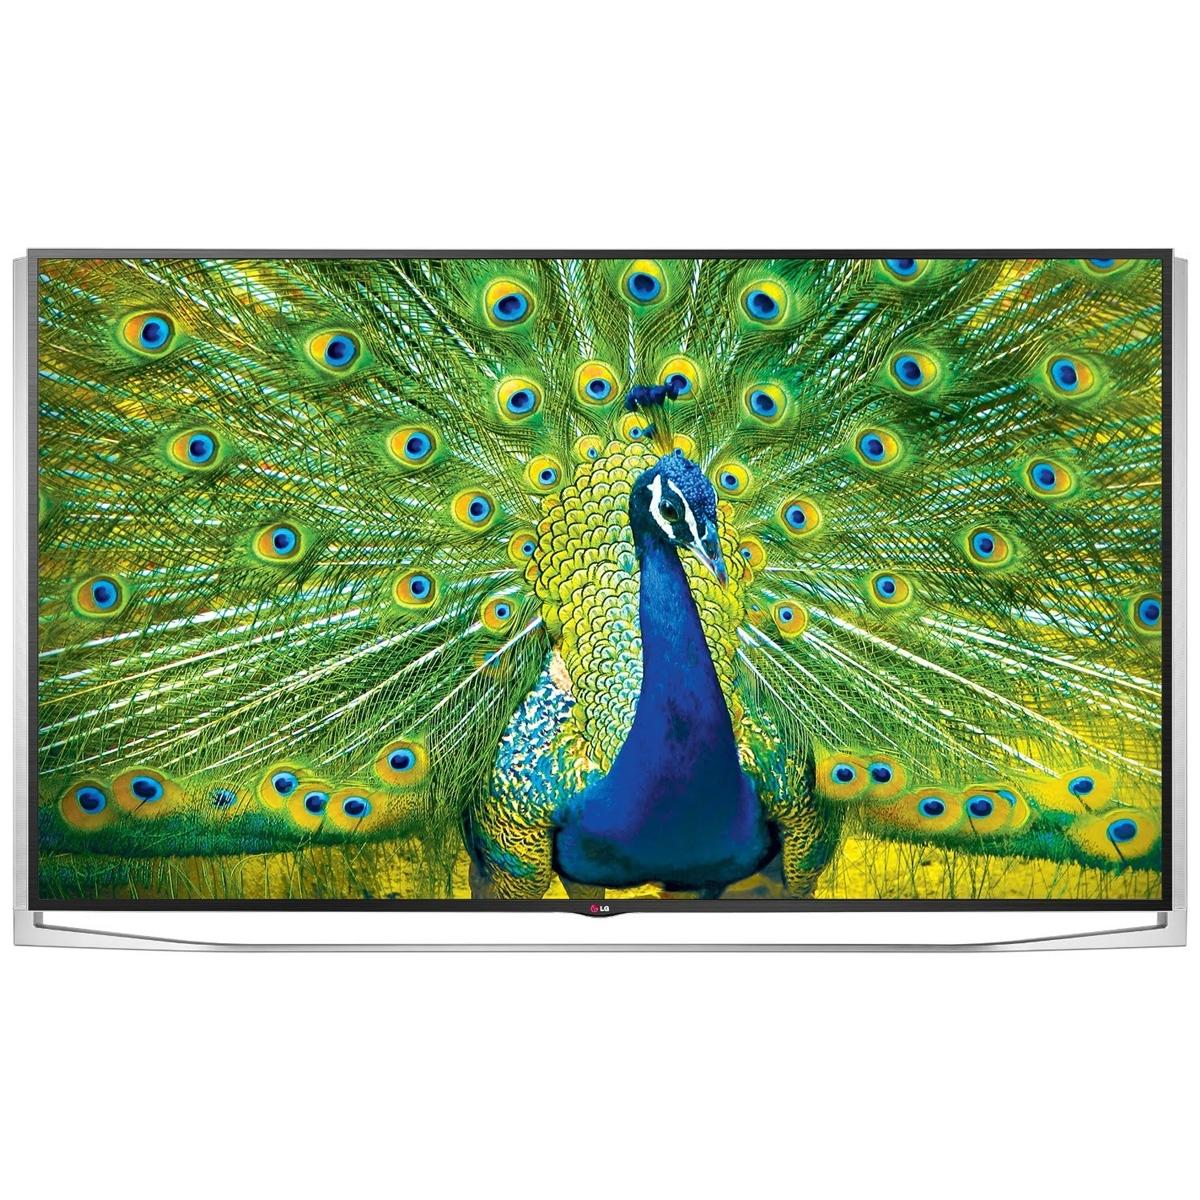 LG 65inch 9800 Series LED 4K Ultra HDTV - 65UB9800